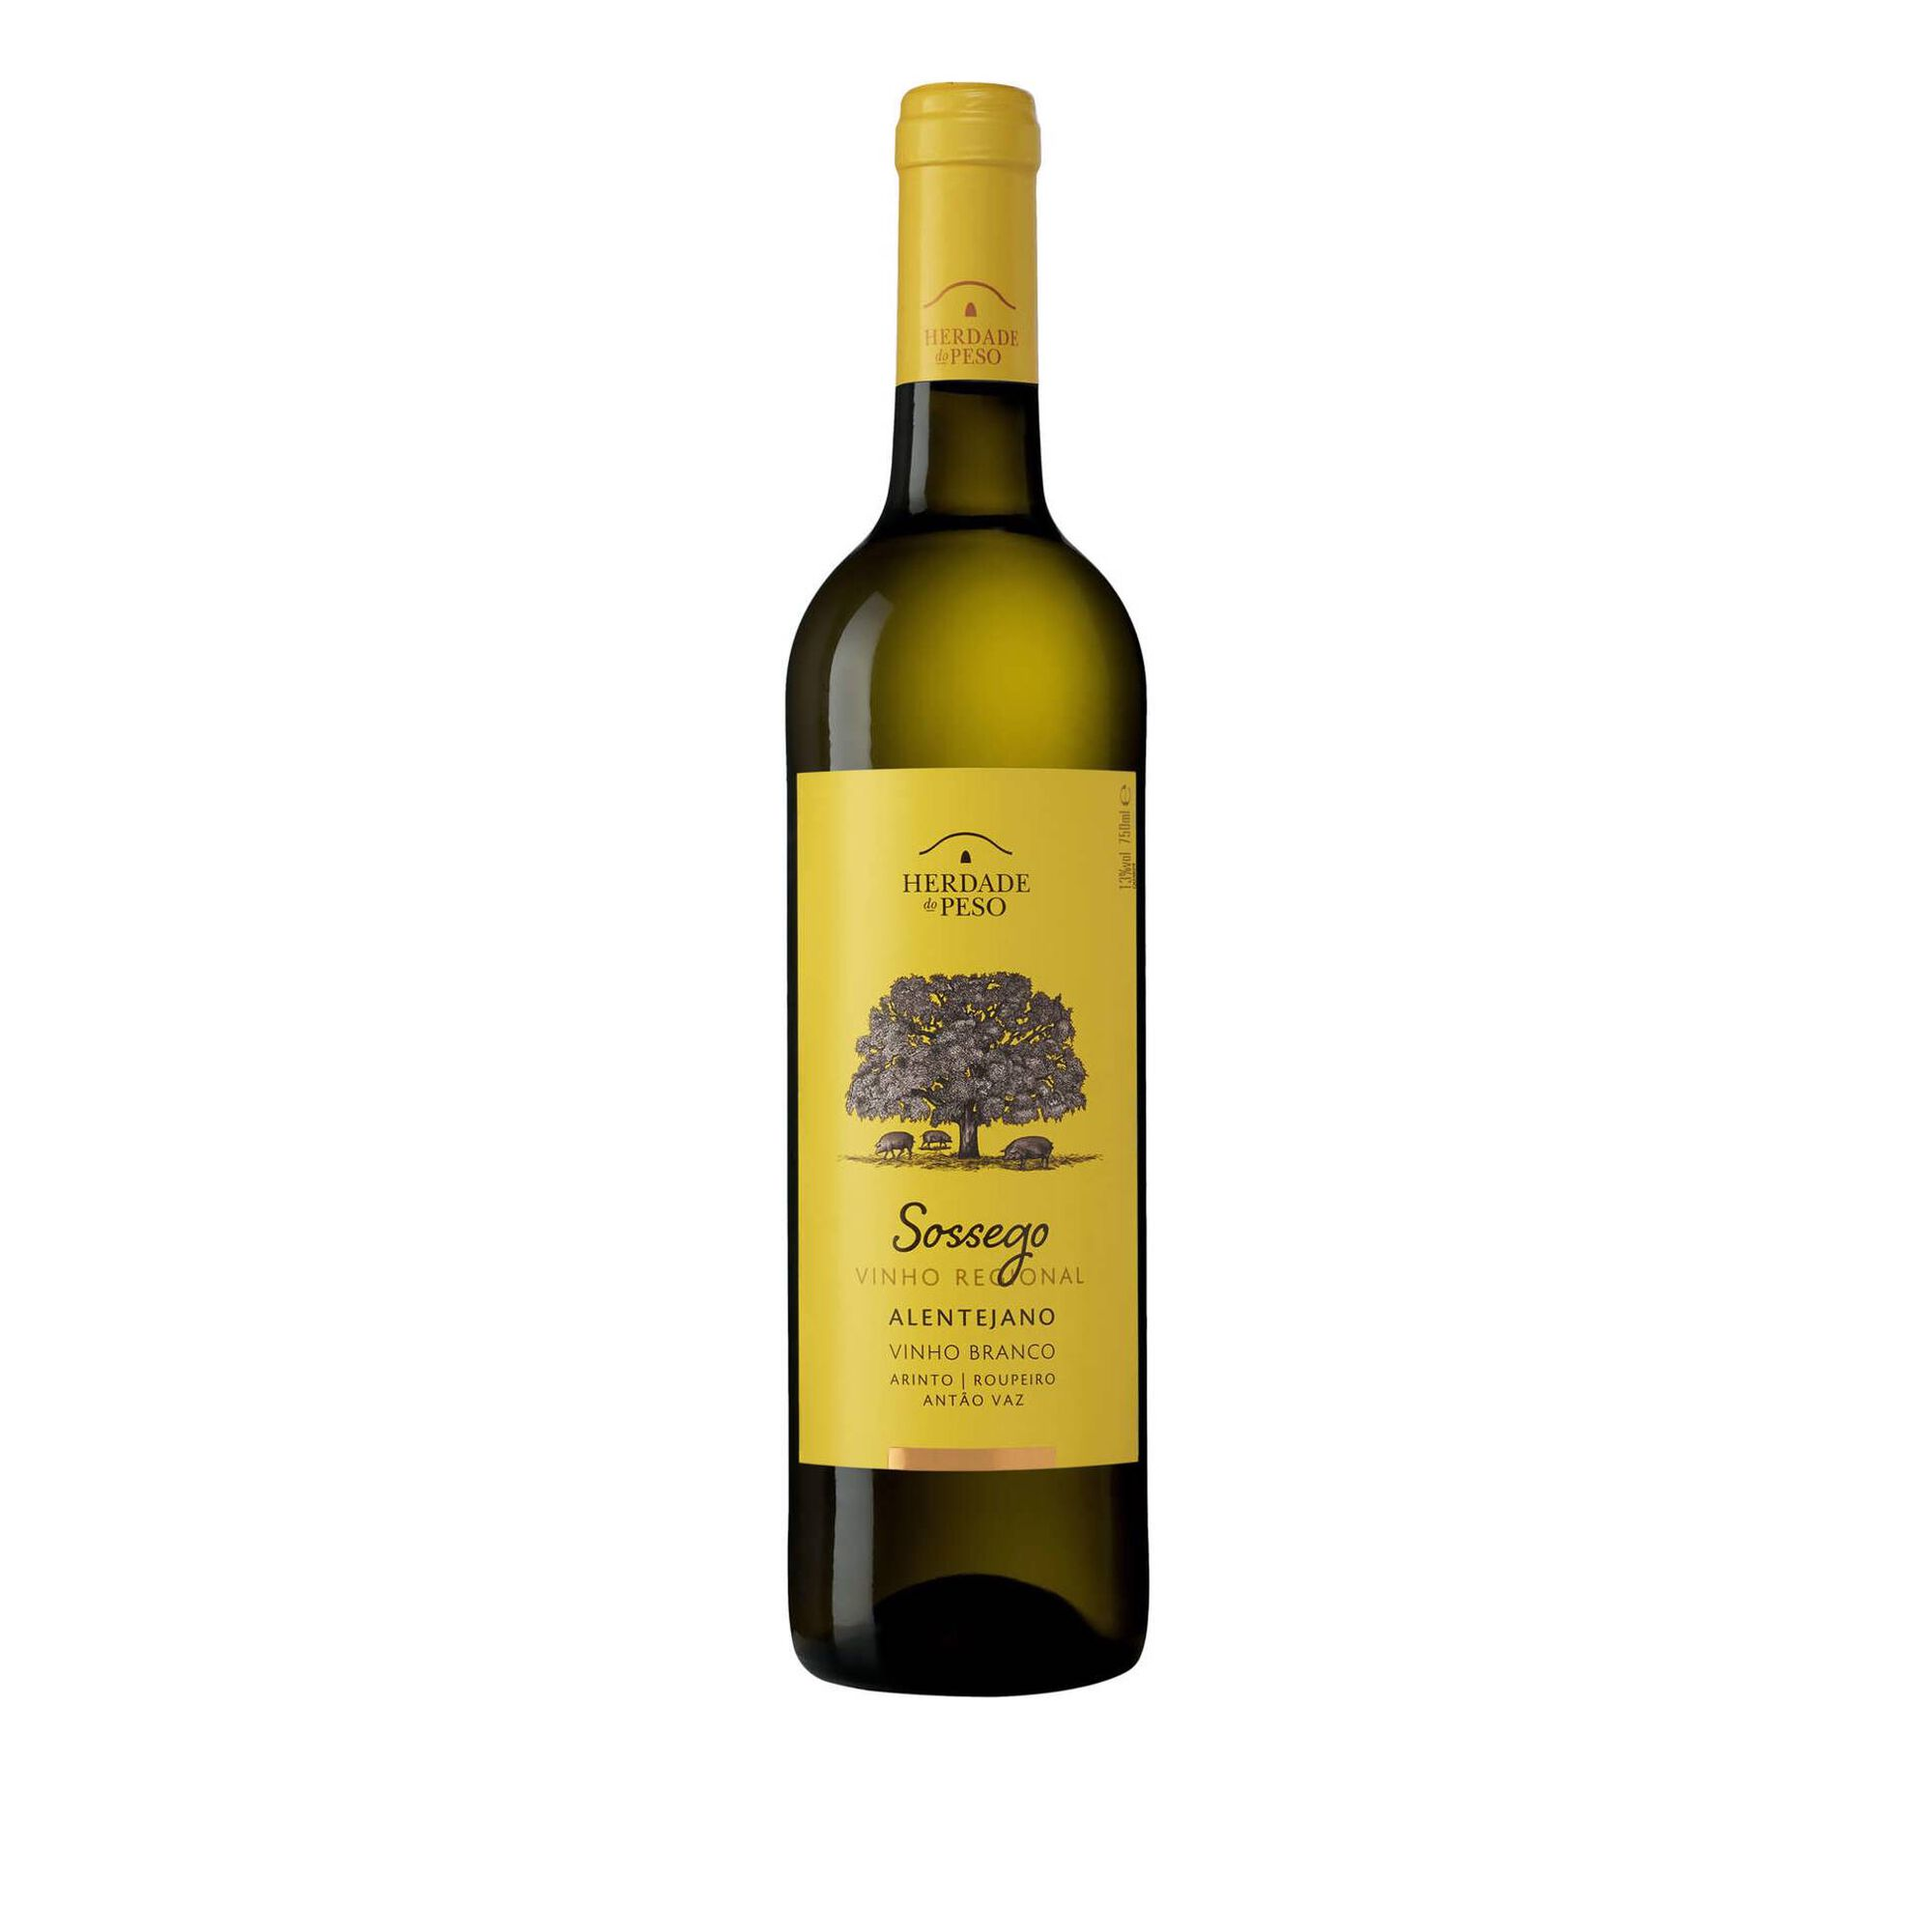 Sossego Regional Alentejano Vinho Branco